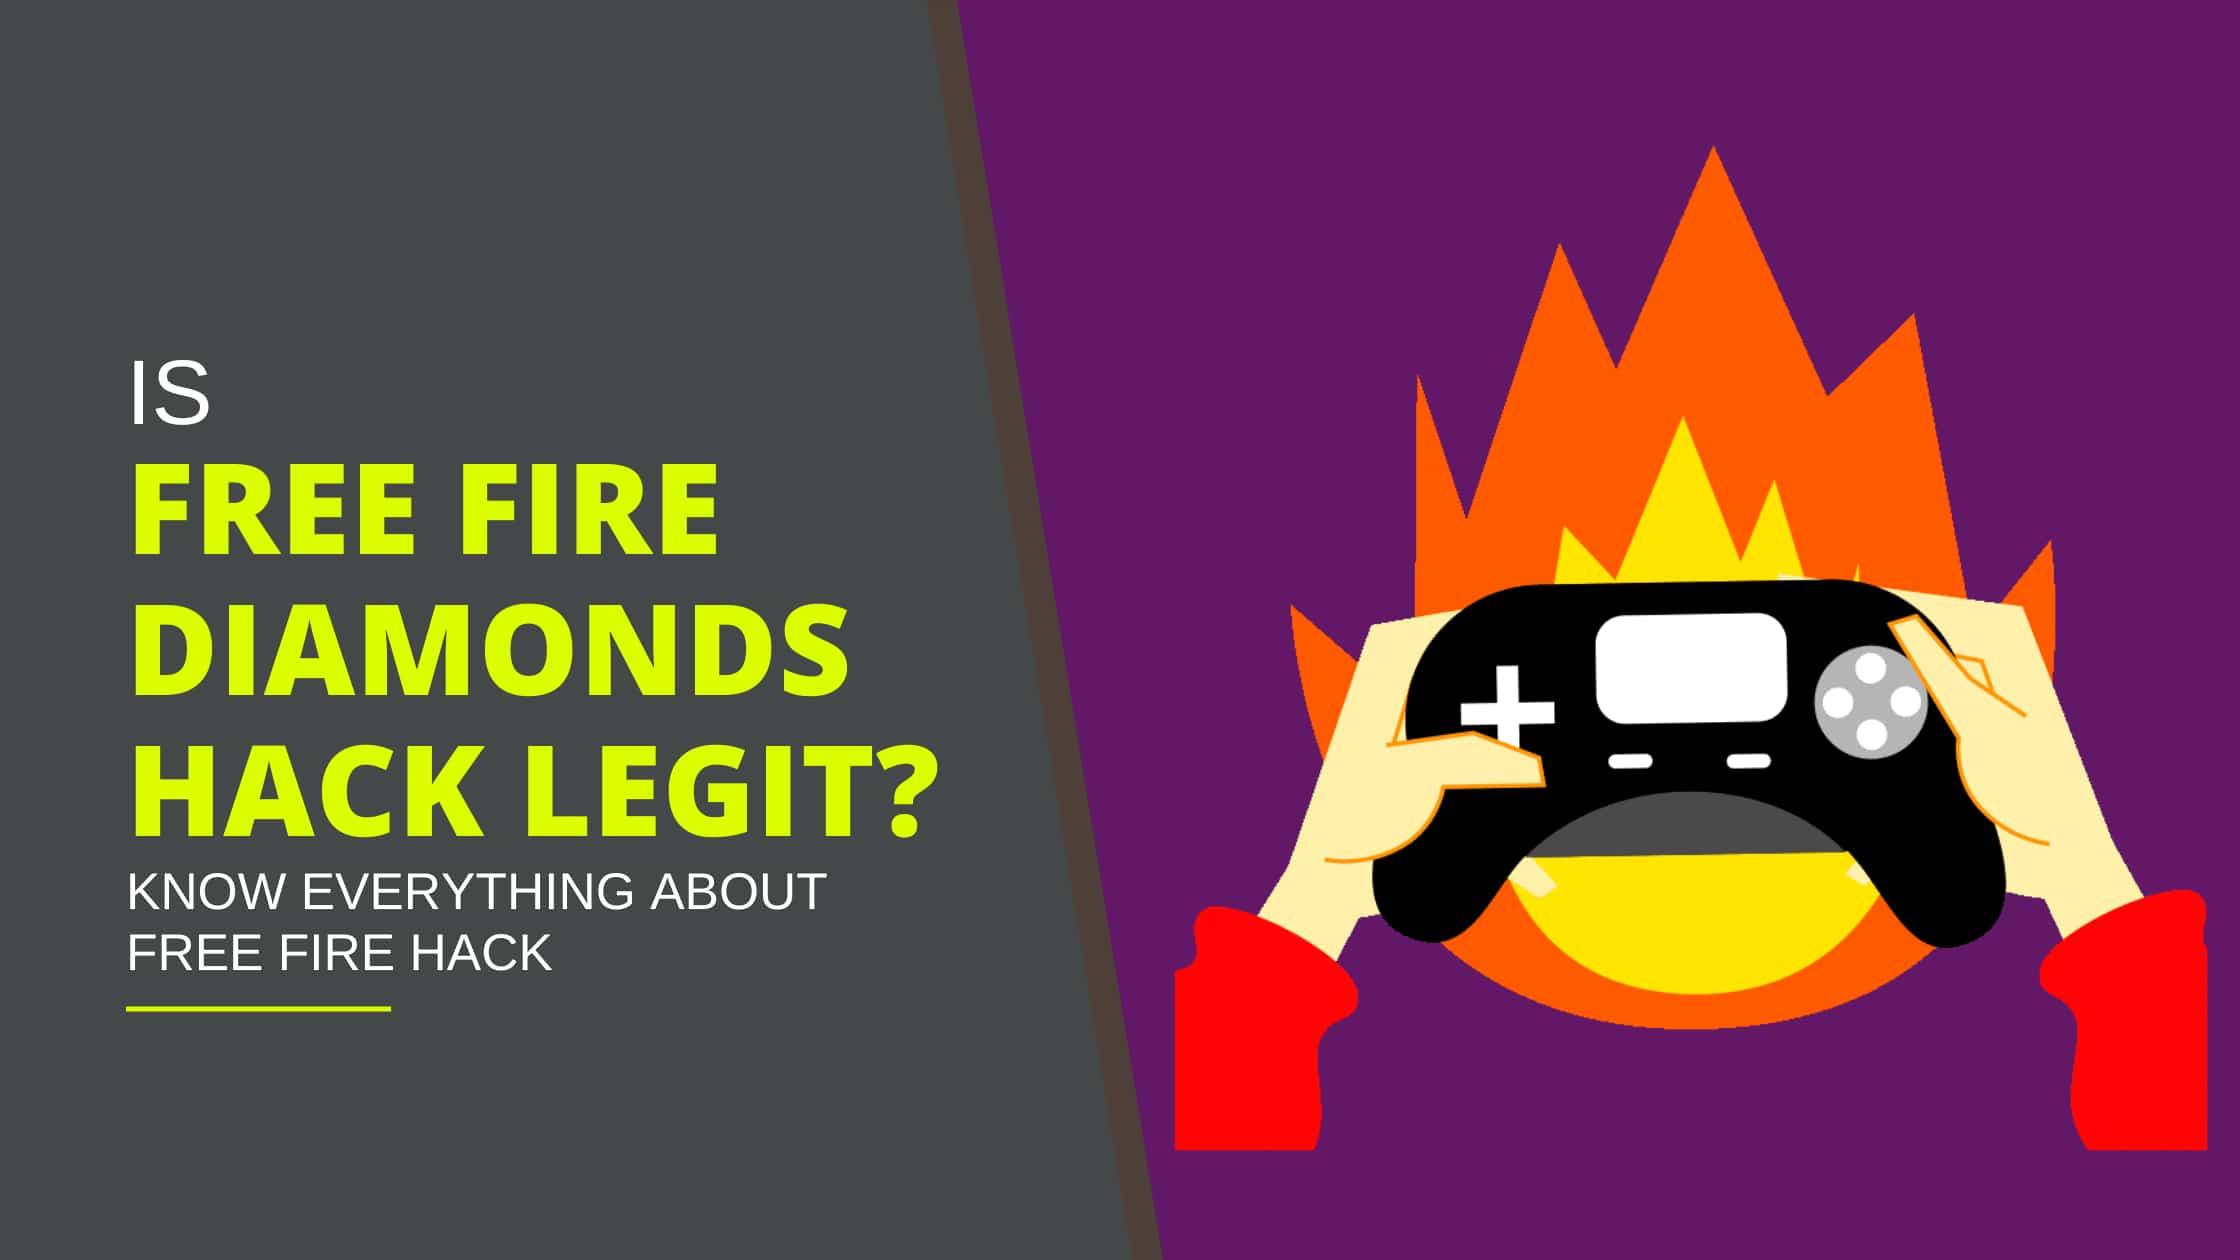 Free fire diamonds hack legit